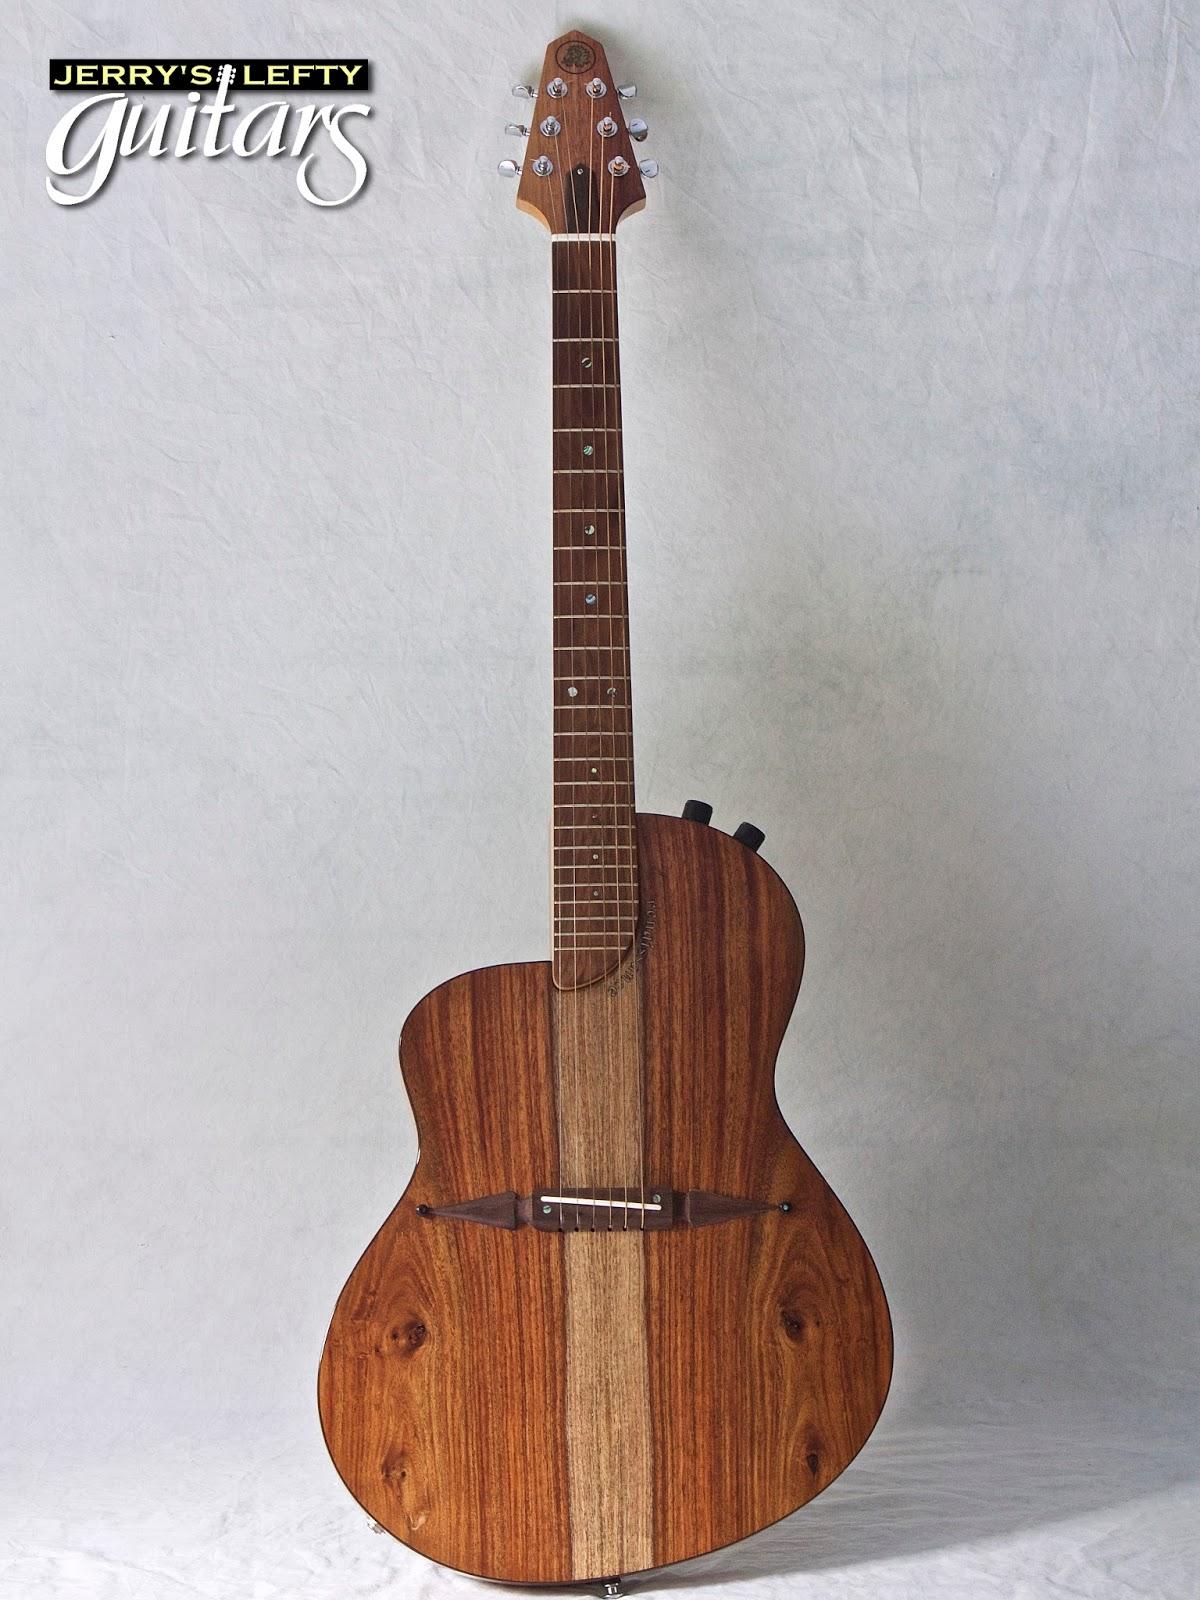 jerry 39 s lefty guitars newest guitar arrivals updated weekly 2014 rick turner renaissance 6. Black Bedroom Furniture Sets. Home Design Ideas